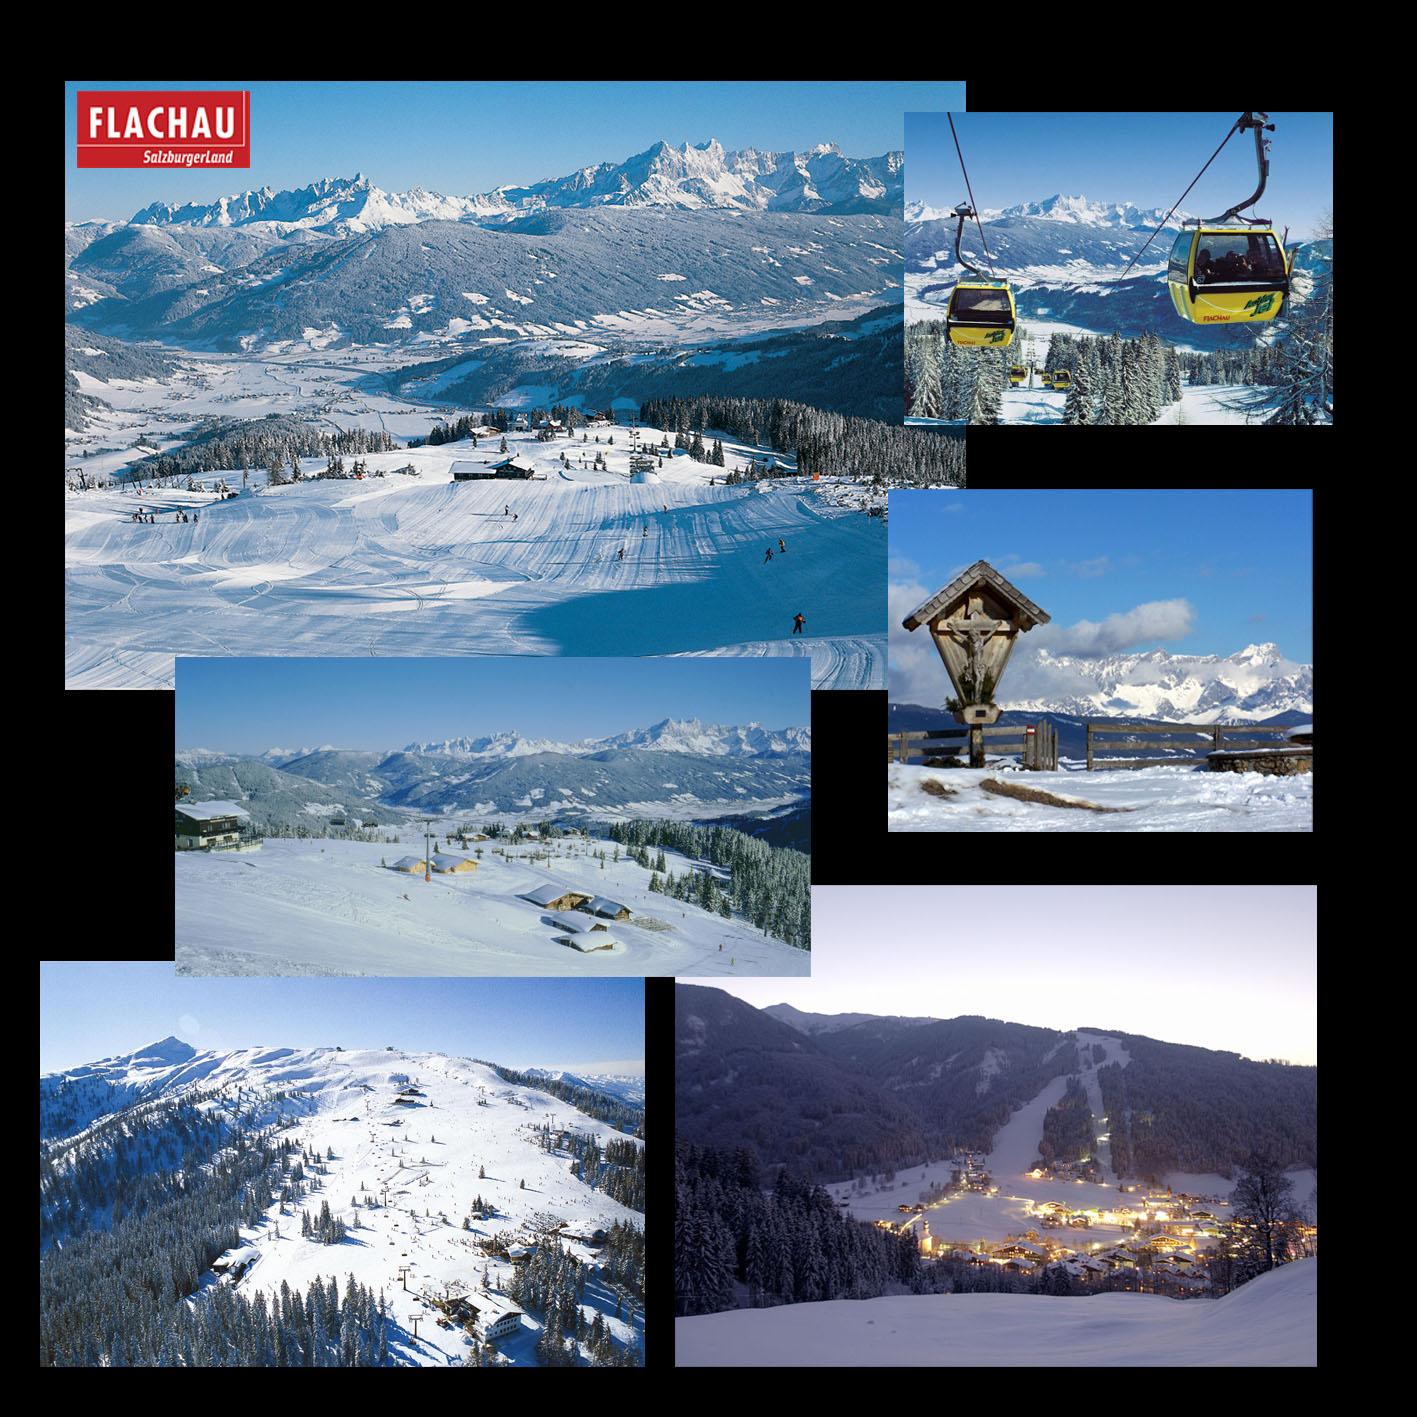 Actuskiracing : L'actu du ski alpin: Flachau - Slalom ...